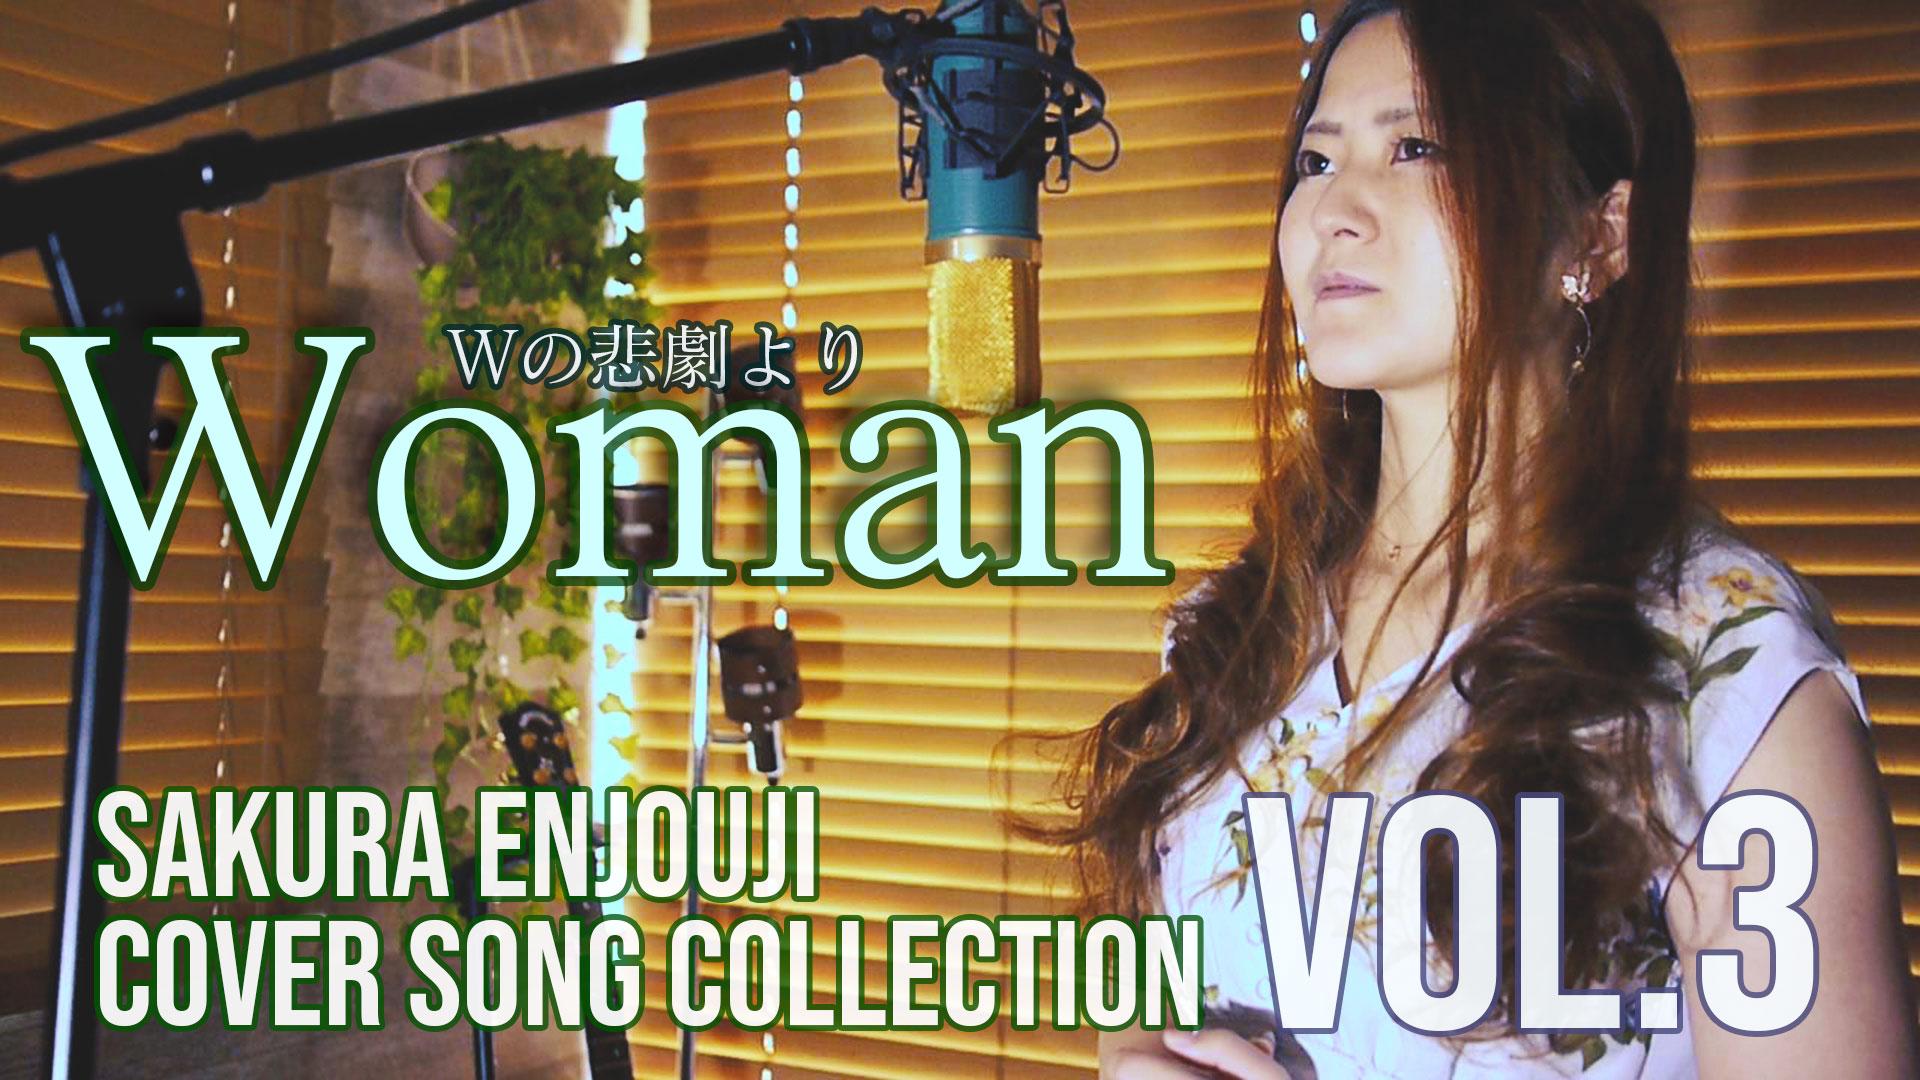 Woman〜Wの悲劇より〜/薬師丸ひろ子cover.